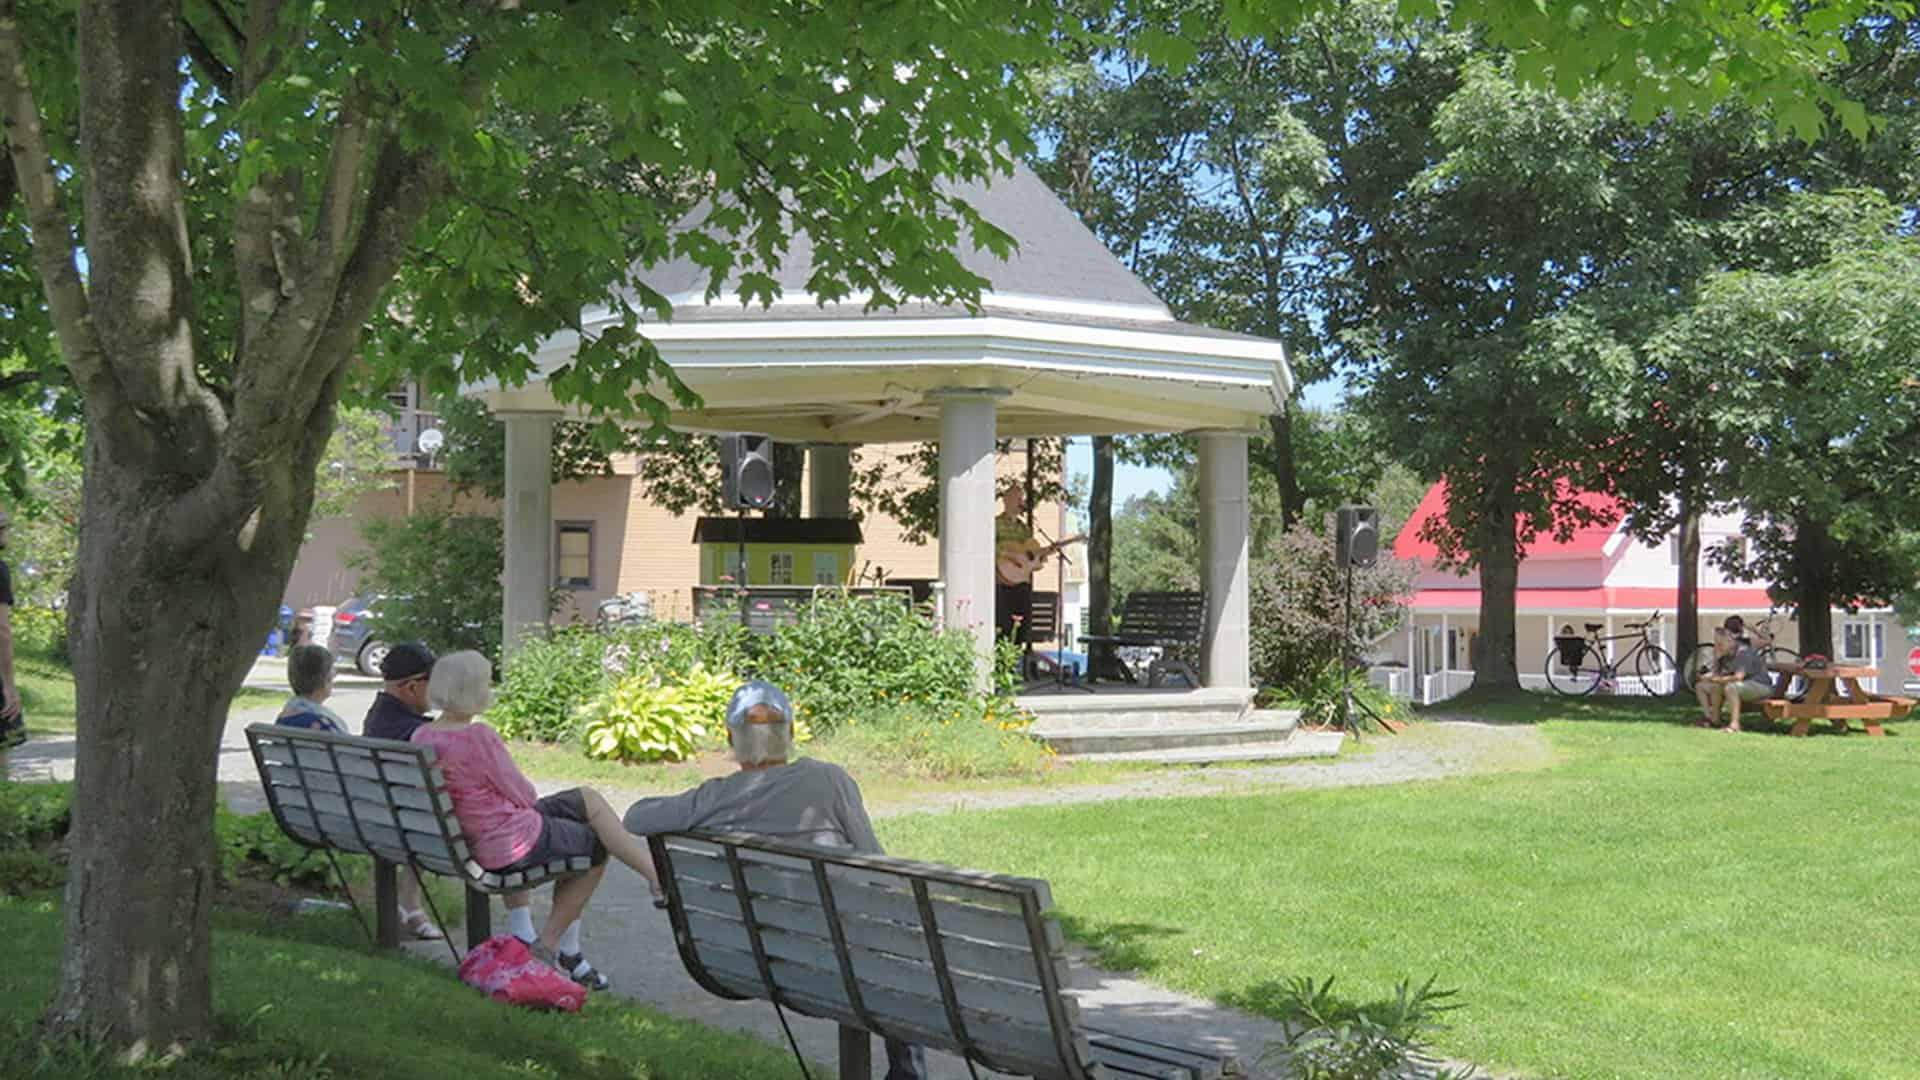 Parc Mansonville - Mansonville